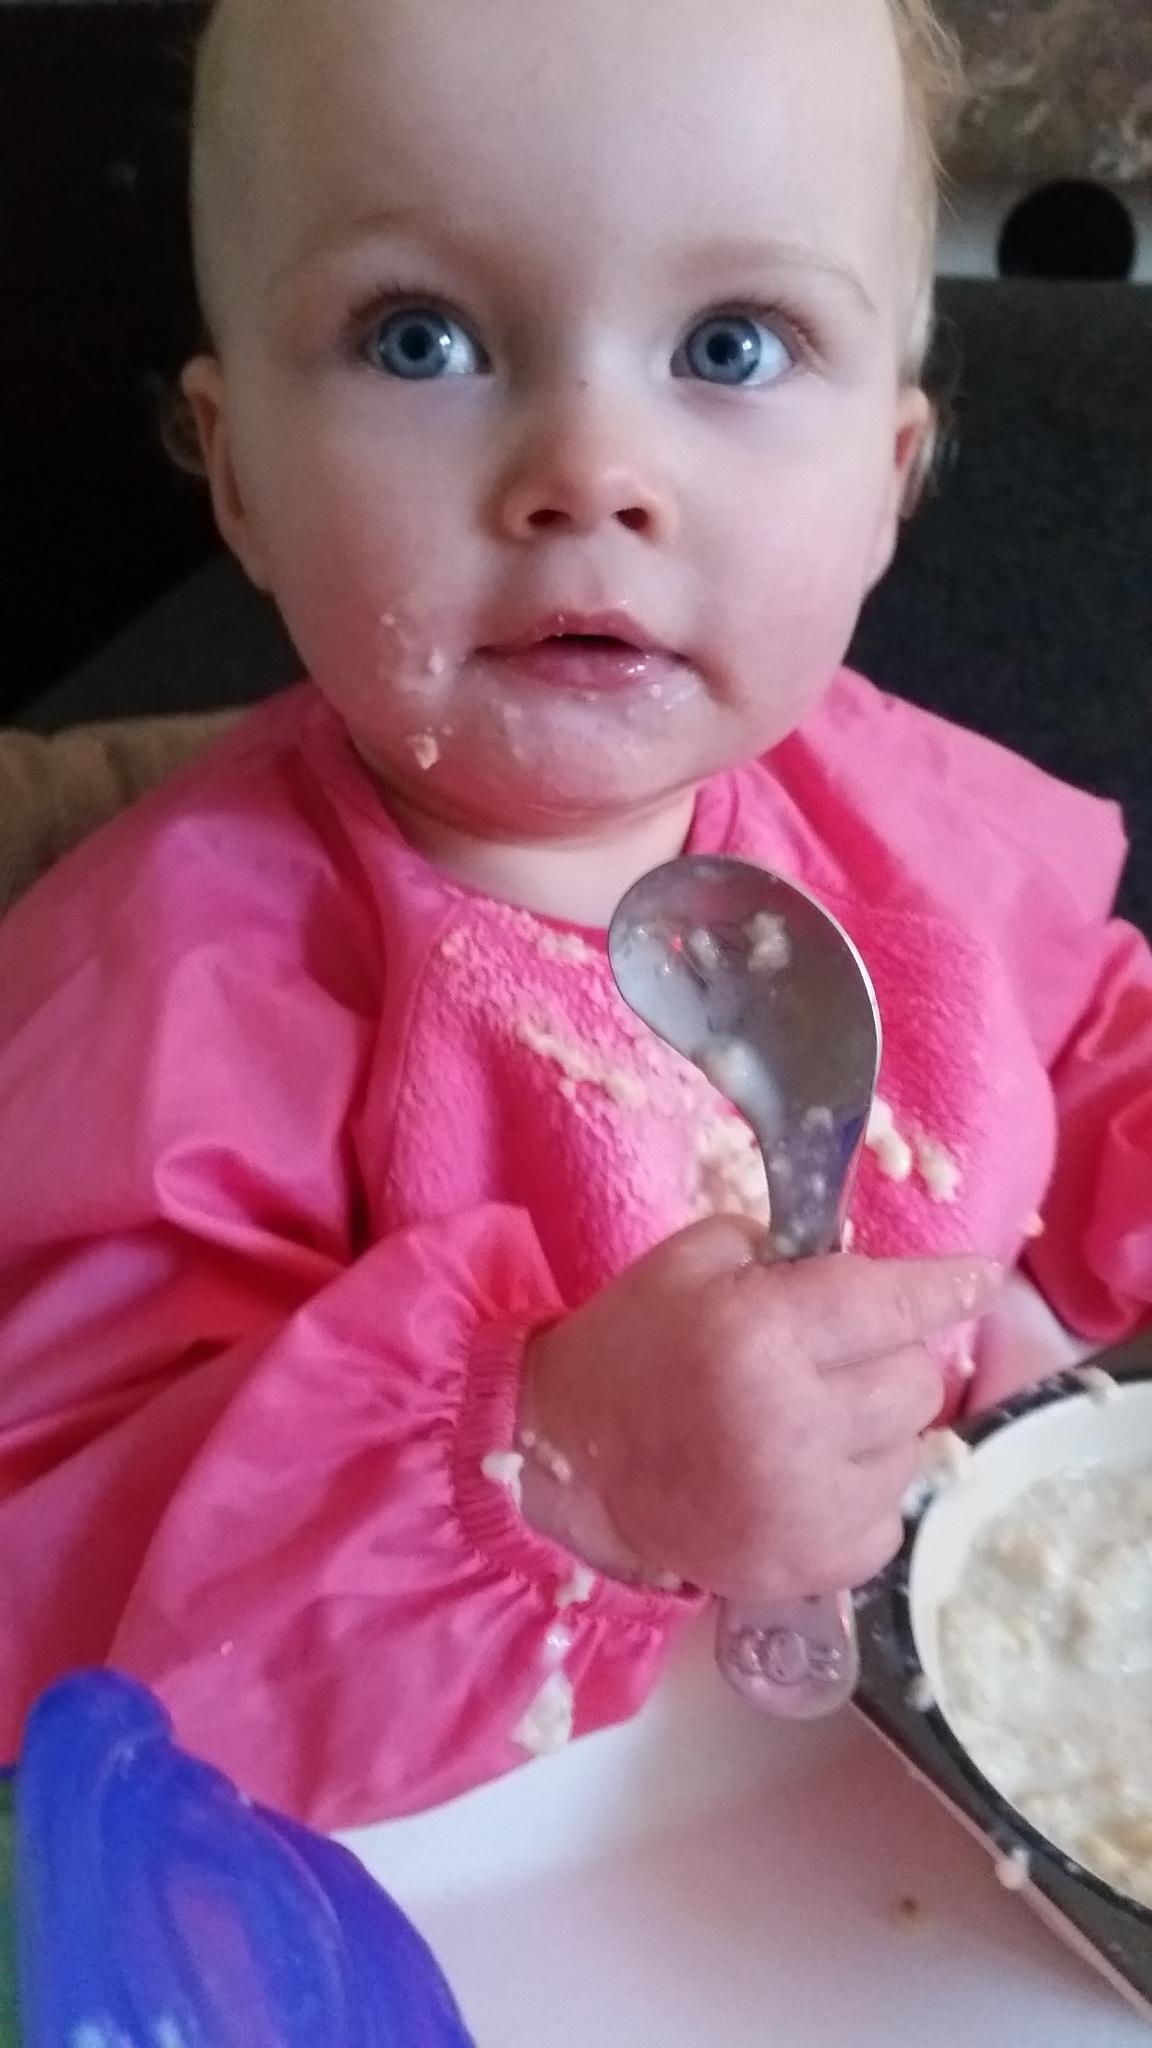 peuter-ontbijt-havermout-havermoutpap-moeder-blog-ontbijt-gezond-1-jaar-baby-eten-silly-billy-slab